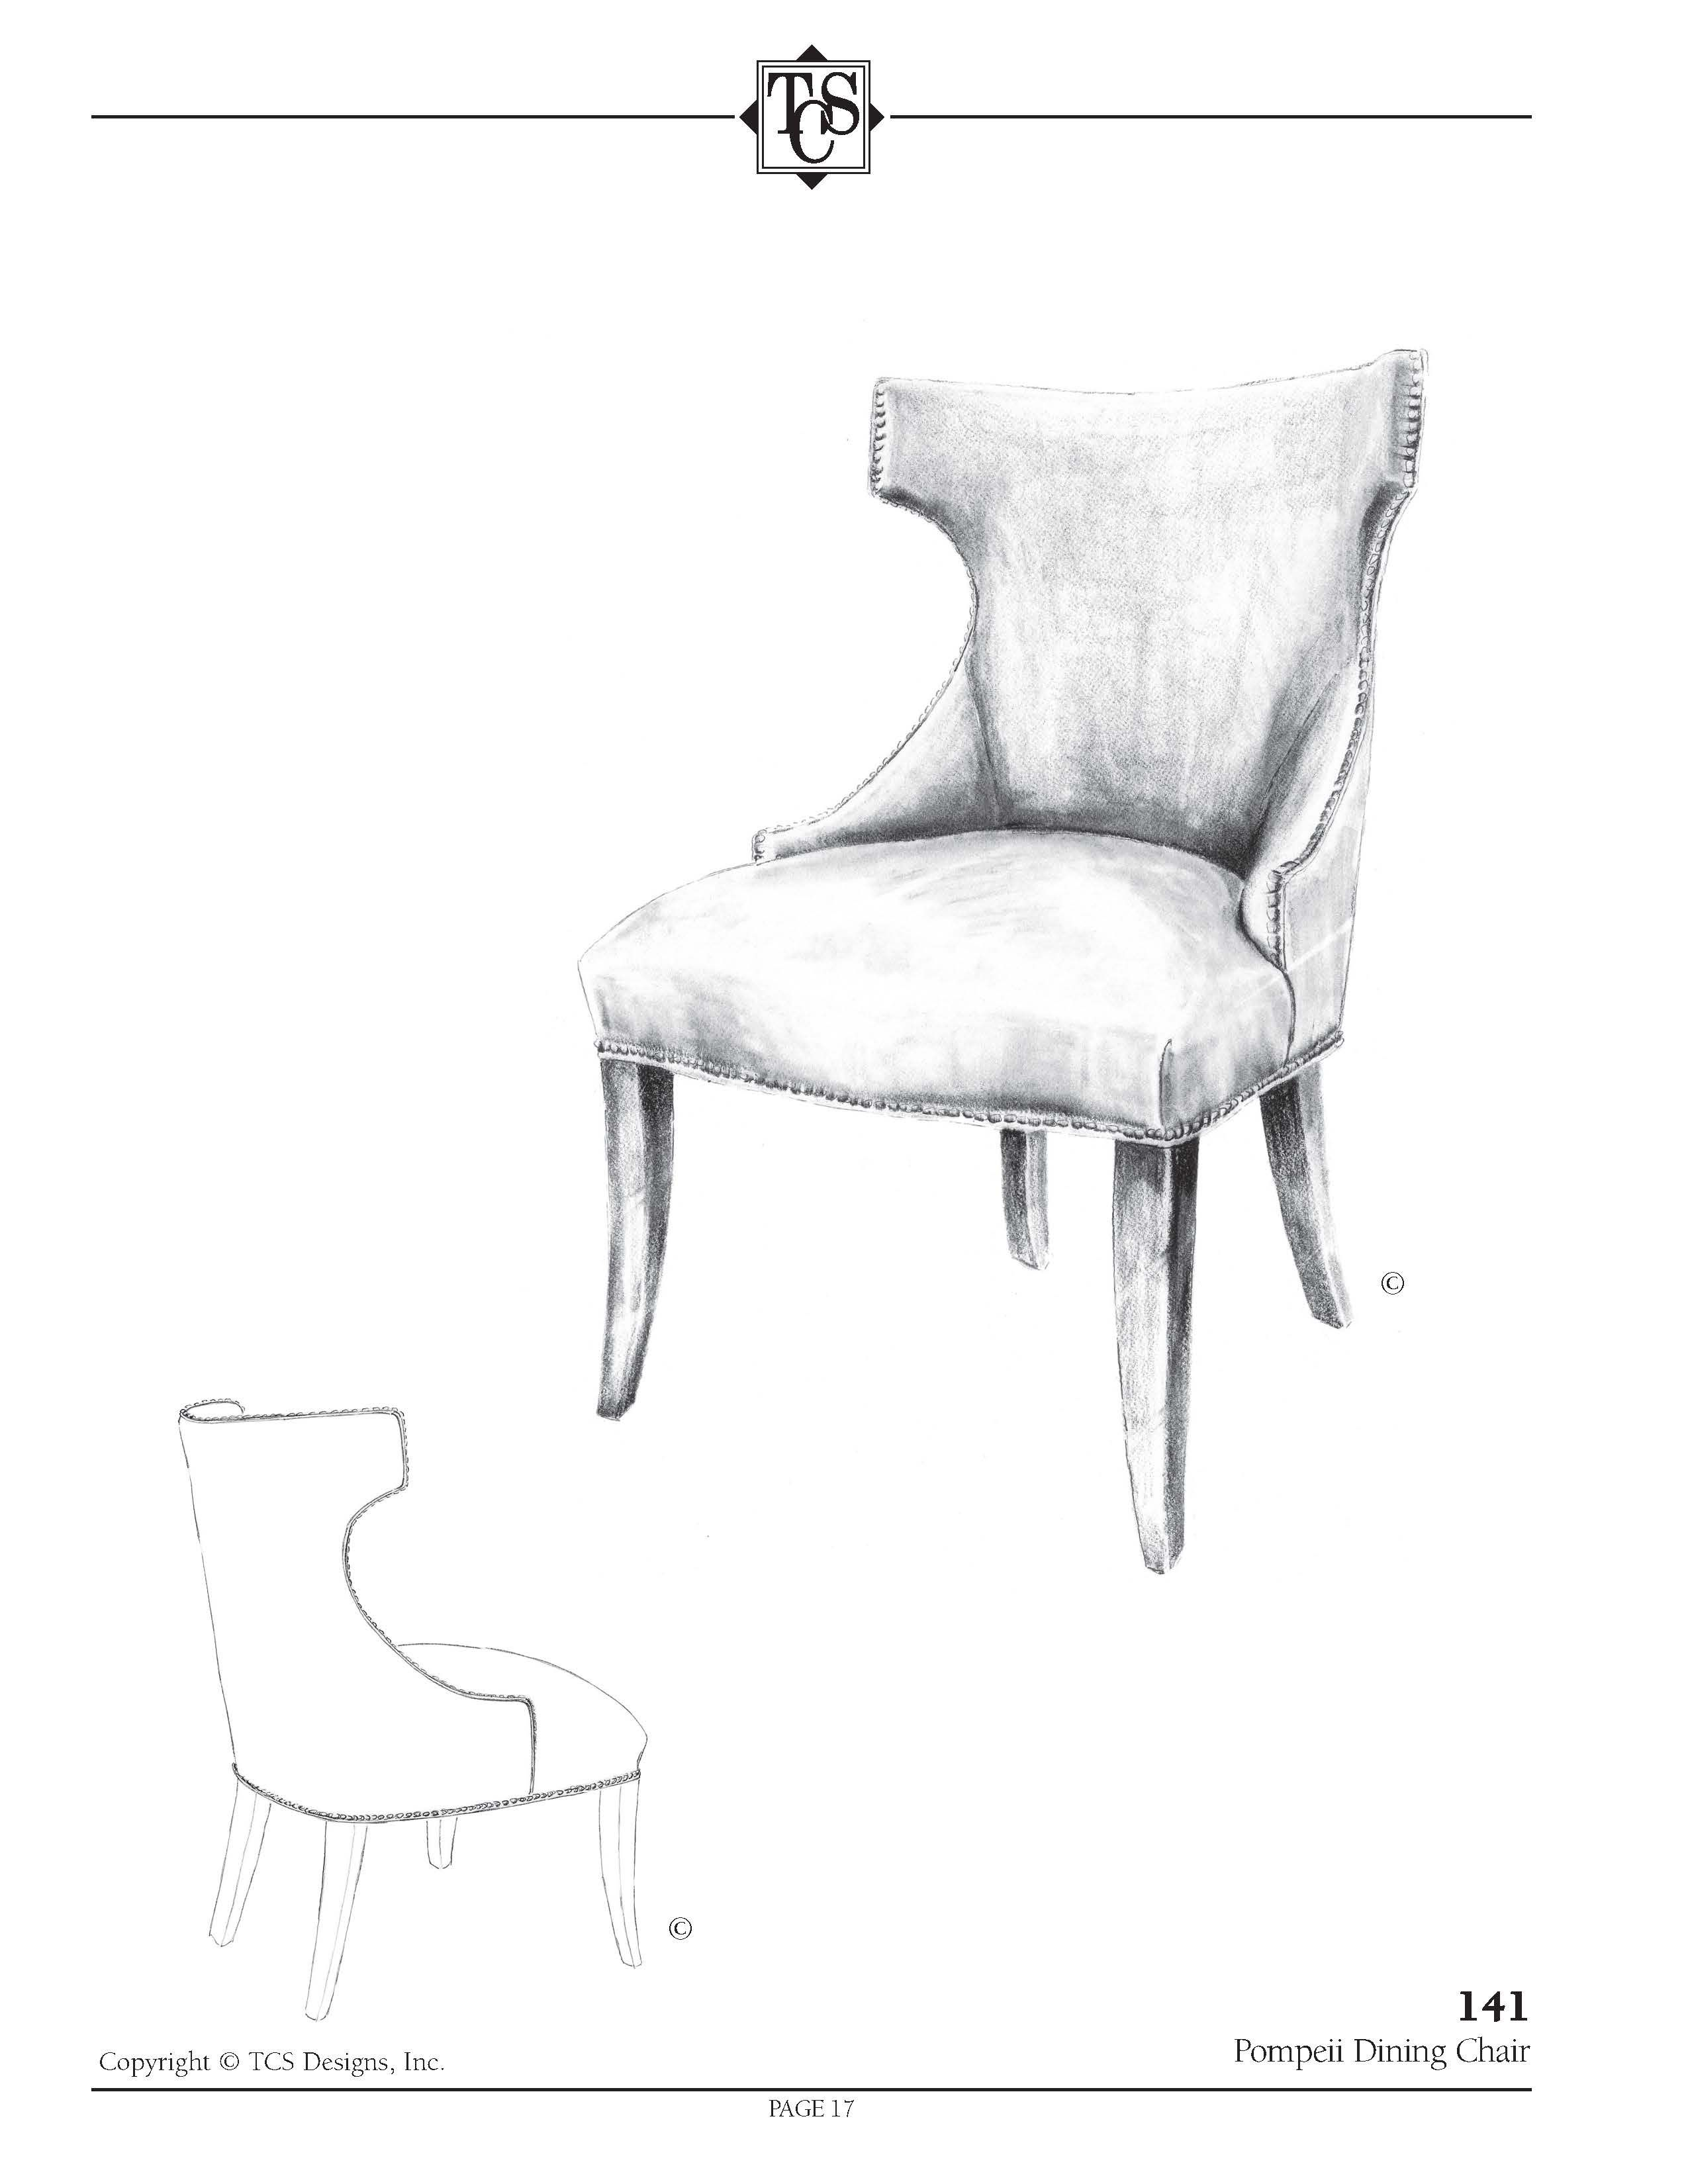 TCS 141 Pompeii Dining Chair 24w x 27d x 38h $395 net page 22